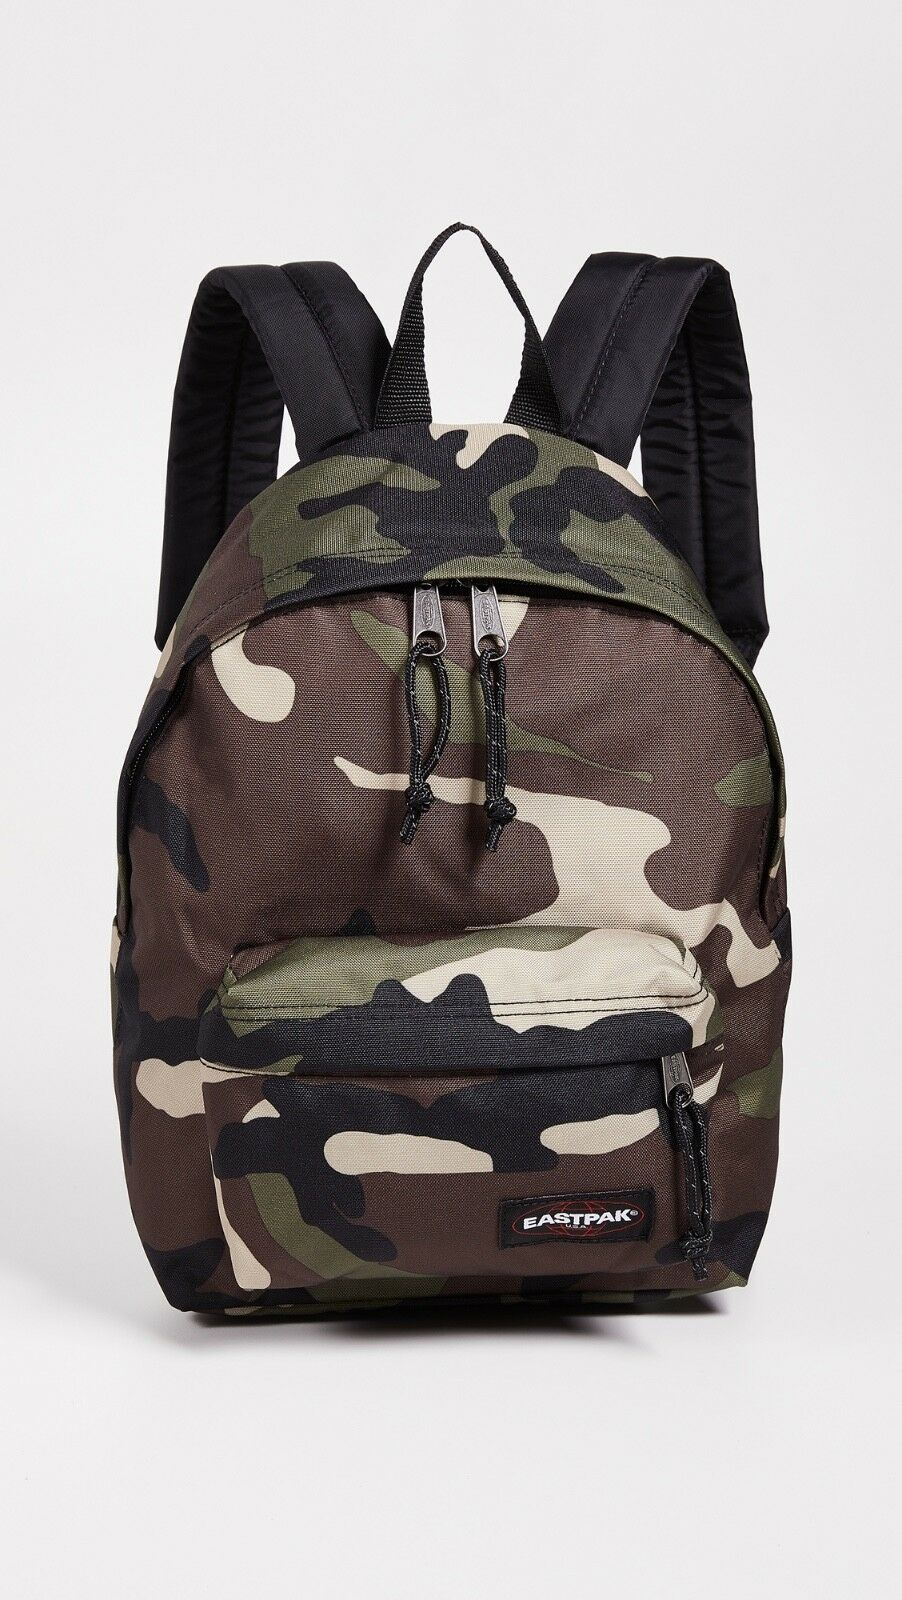 251593e392d Eastpak Orbit Mini Backpack 10l in Camo Print 181 for sale online | eBay